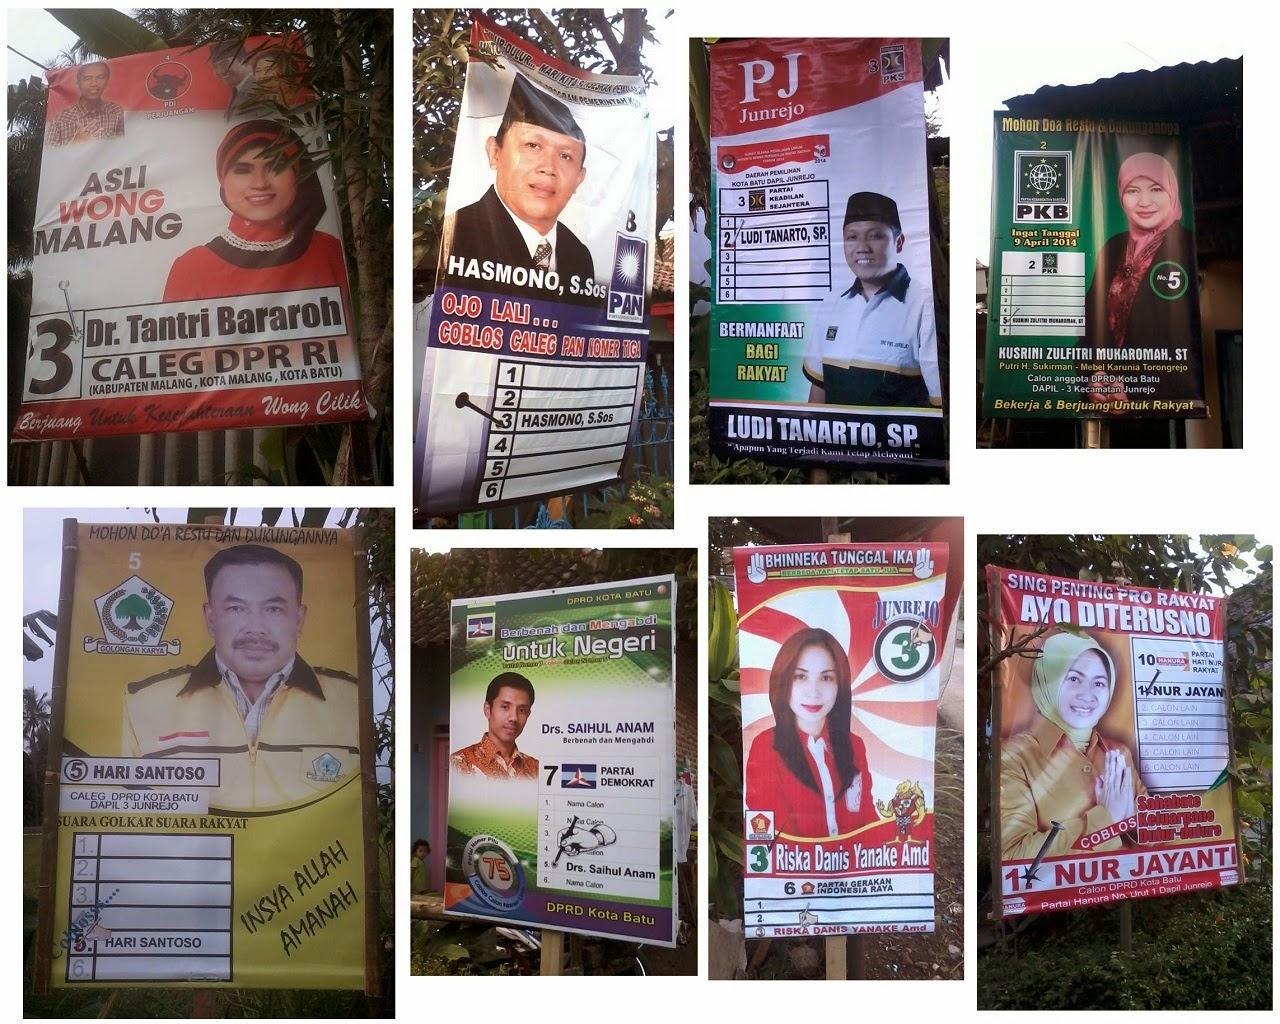 Poster Calon DPRD Kota Batu 2014